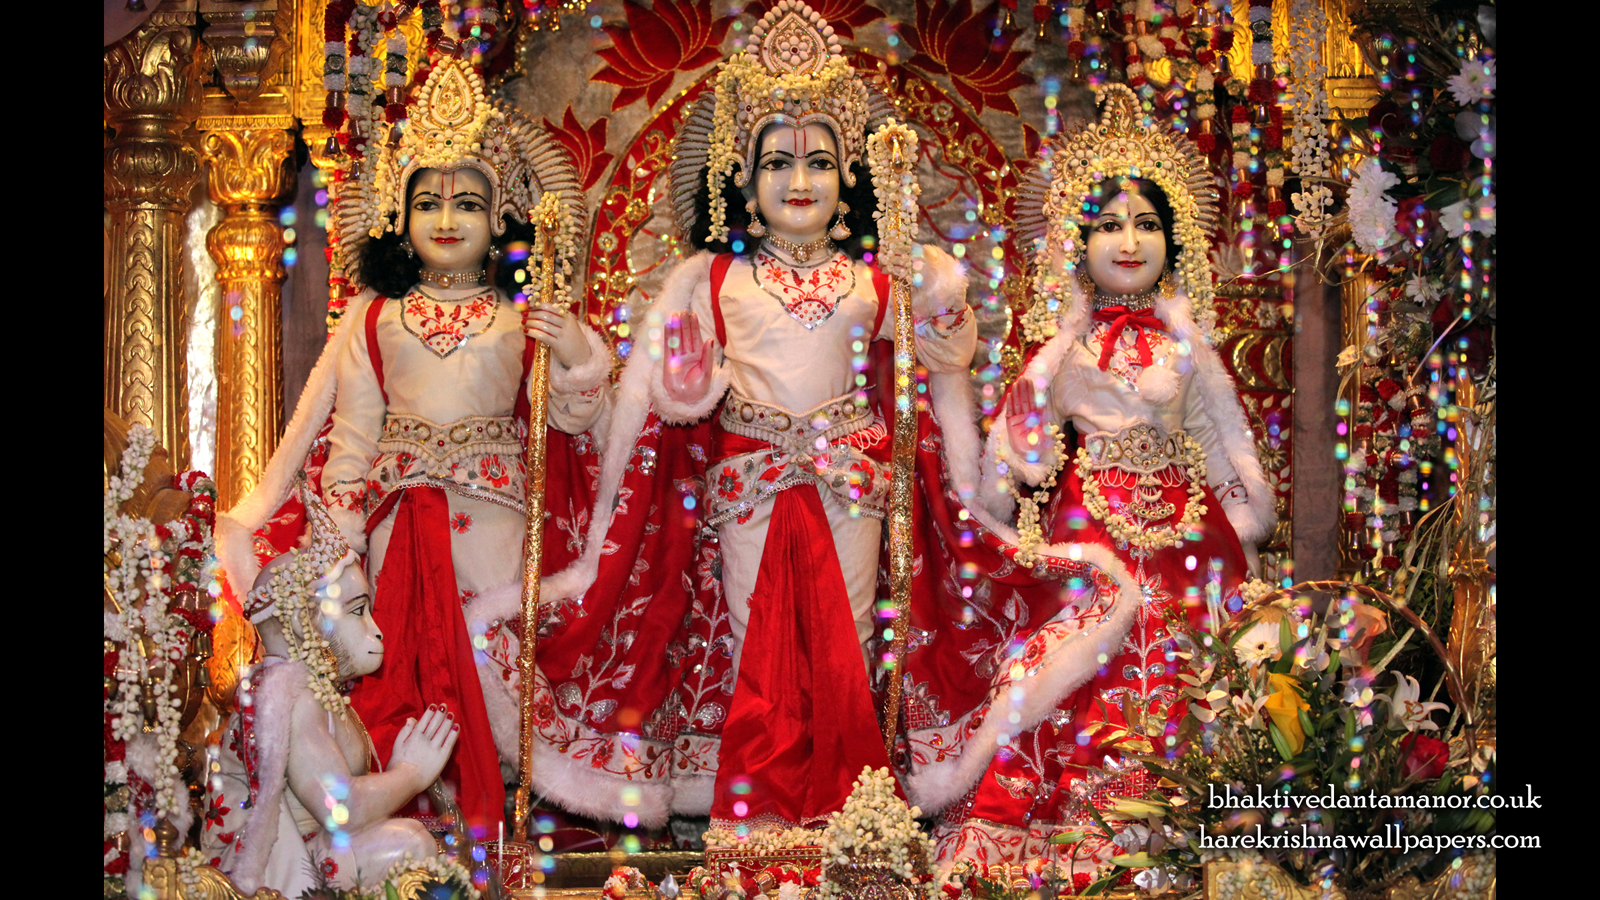 Sri Sri Sita Rama Laxman Hanuman Wallpaper (010) Size 1600x900 Download